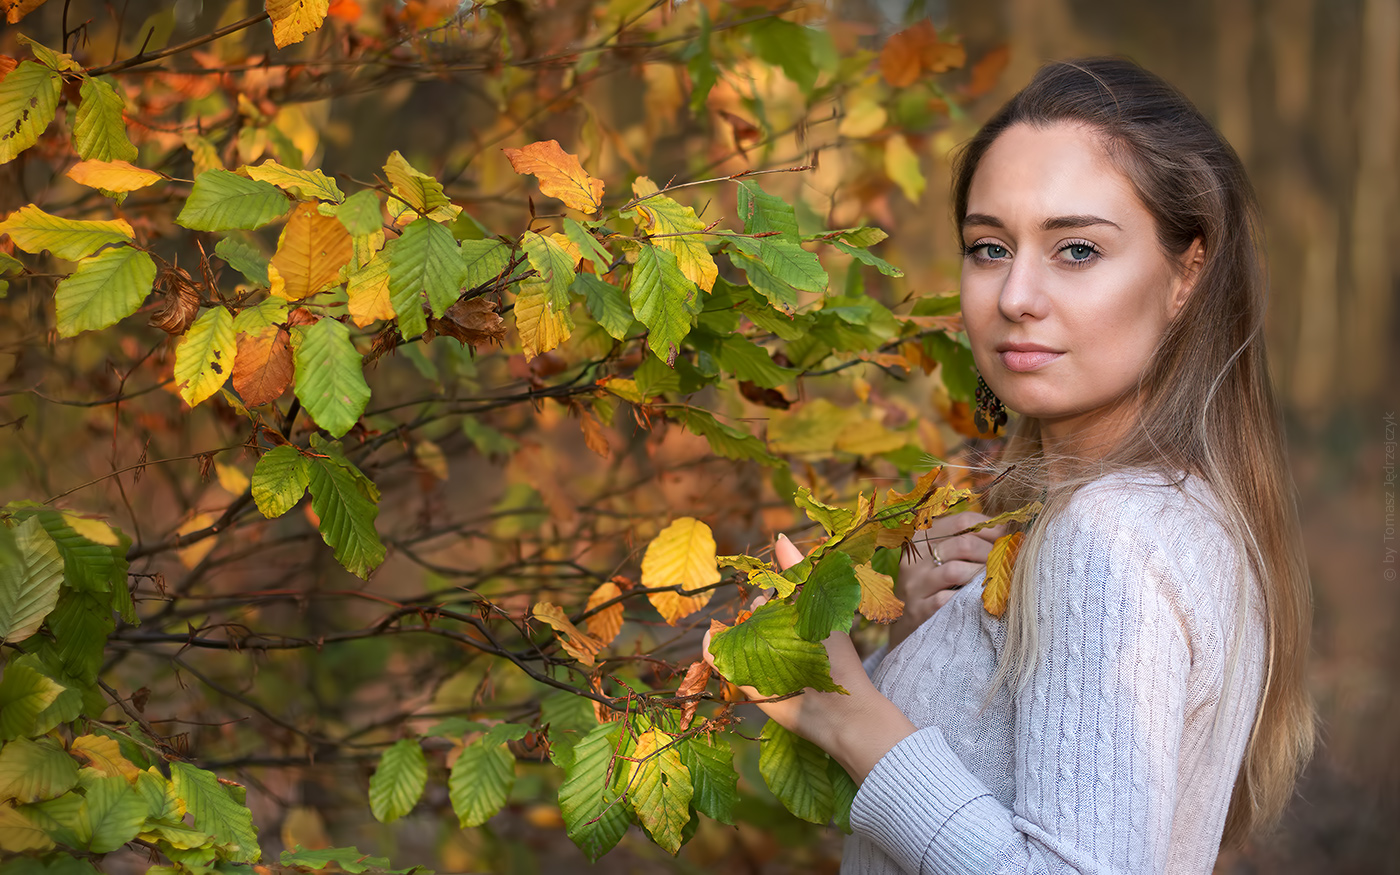 Autumn nostalgy